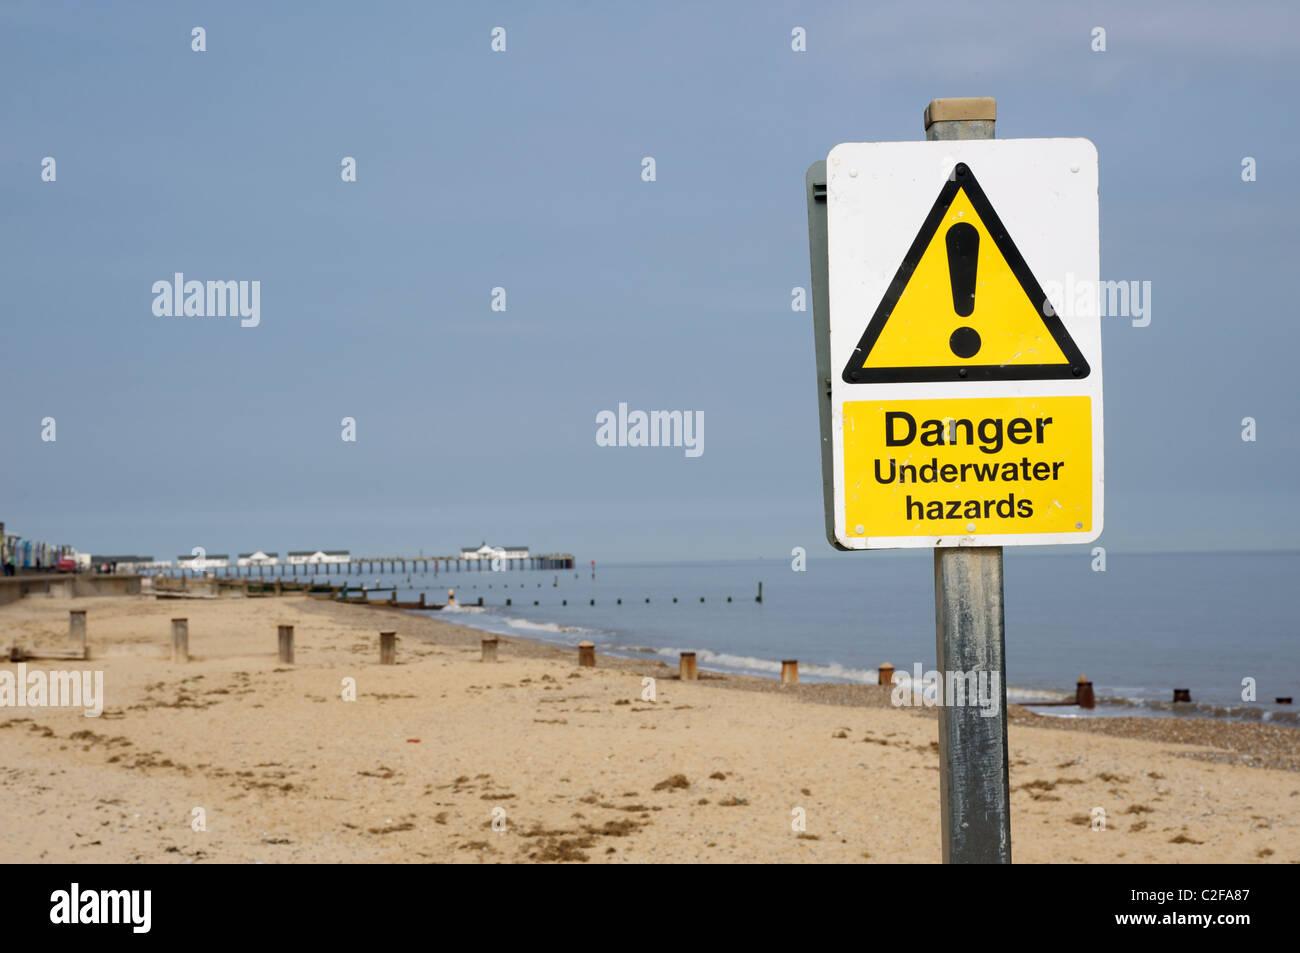 Danger underwater hazards sign, Southwold, Suffolk, UK. - Stock Image